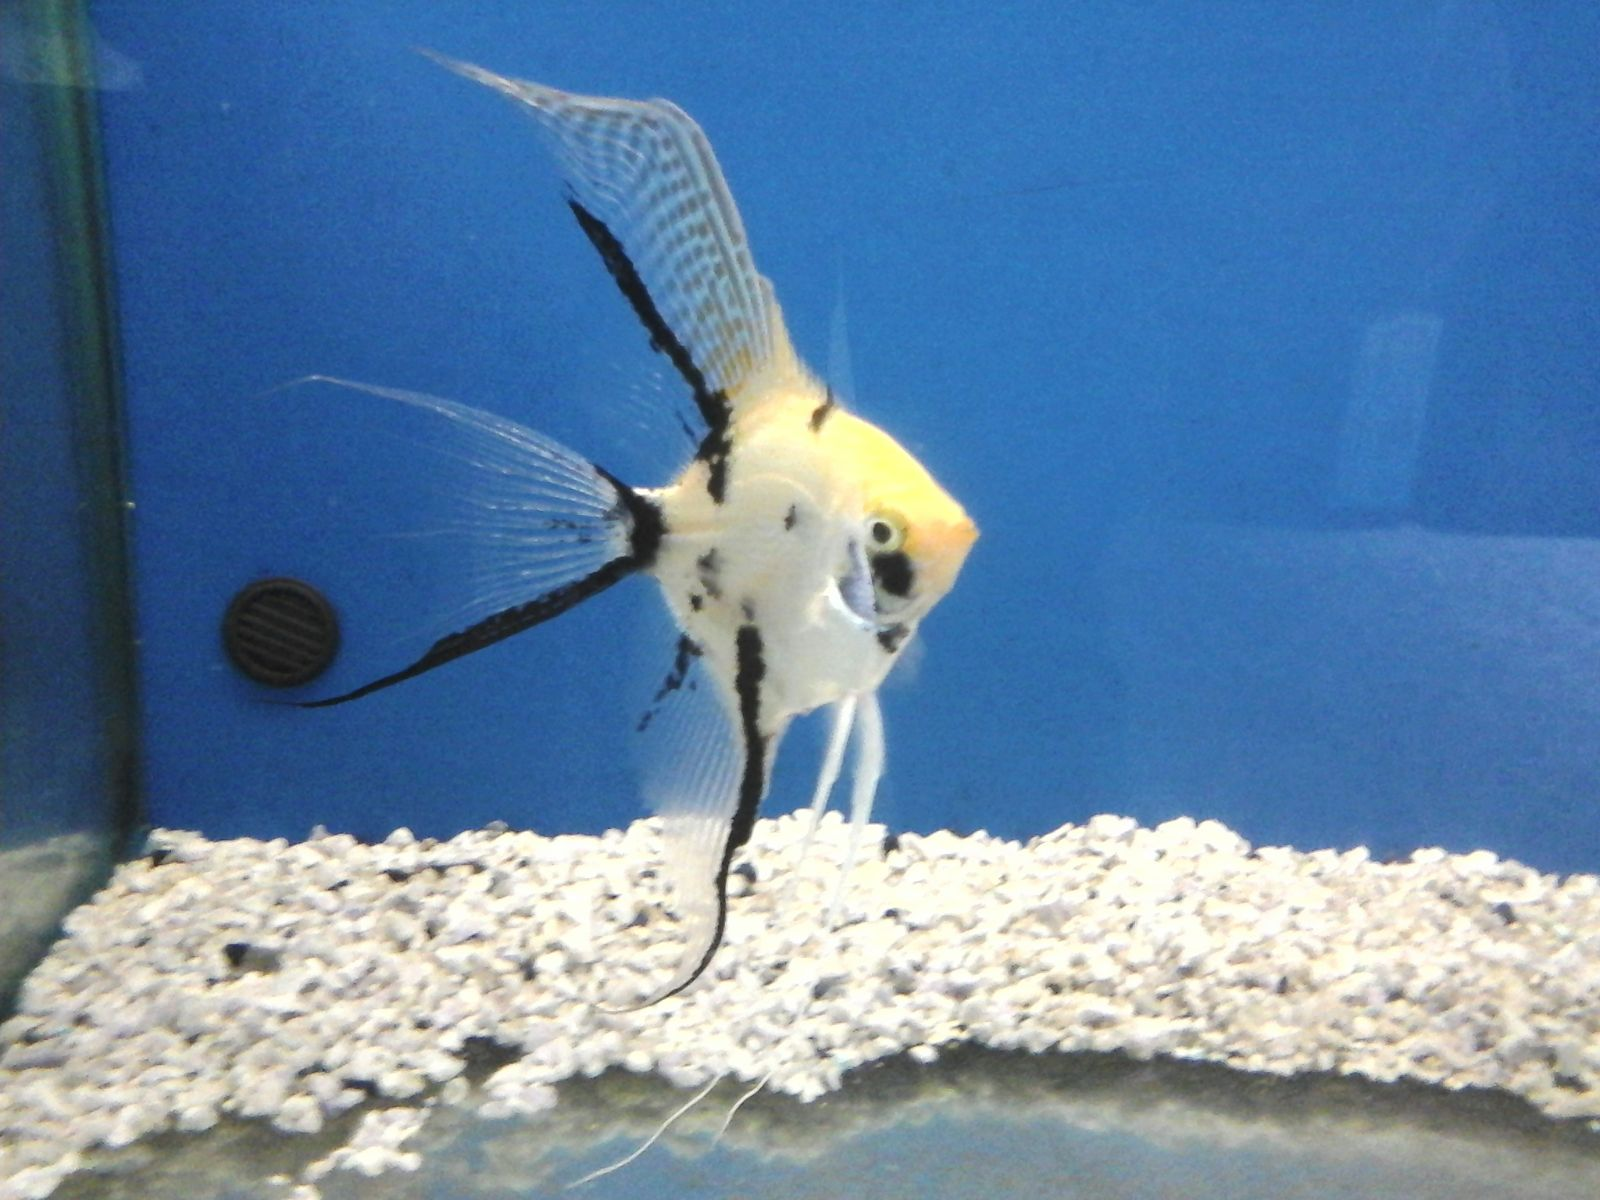 Pirana aquarium pesci tropicali d 39 acqua dolce i ciclidi for Pesci acquario